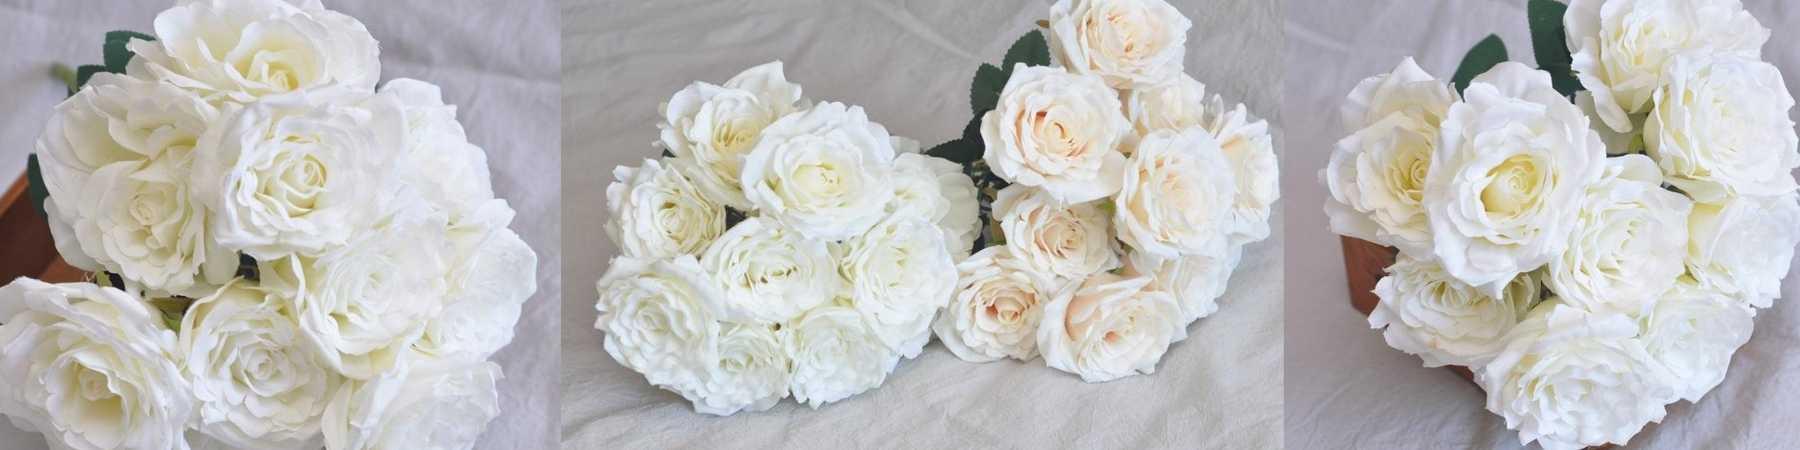 Classy Fake Flower Arrangements4